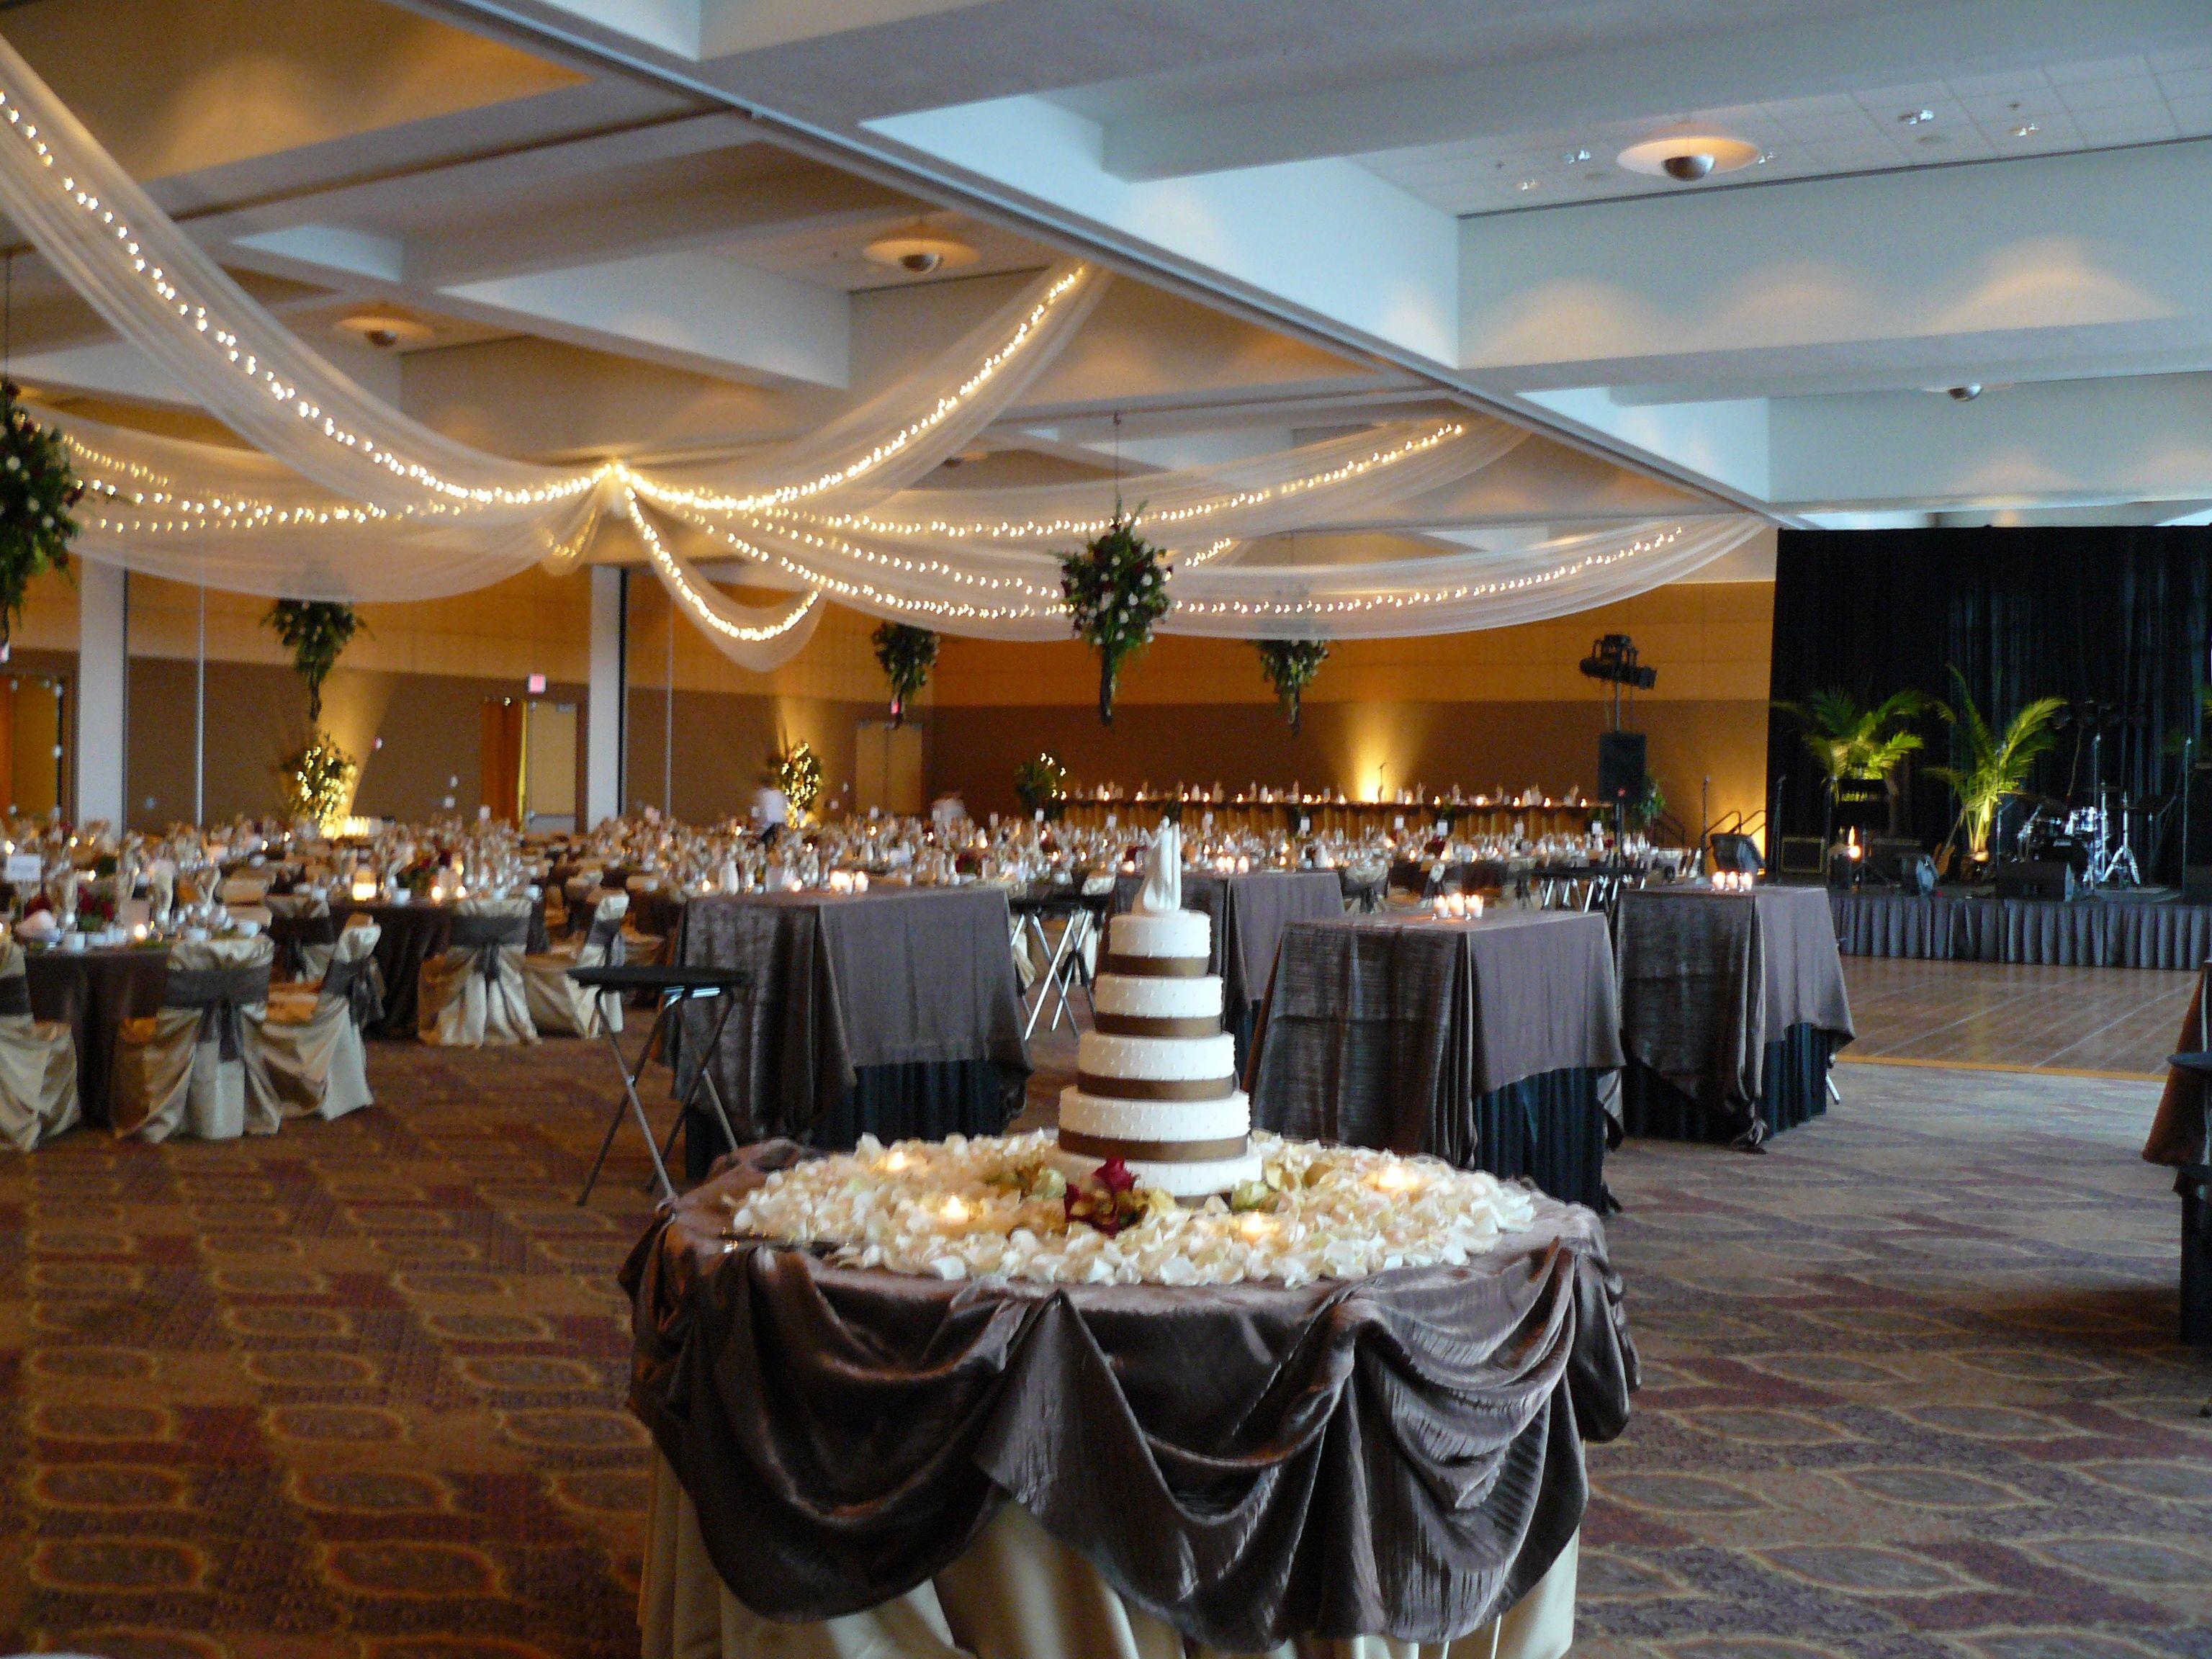 wedding reception restaurants mn%0A Glensheen Mansion Duluth  MN   Happily Ever After   Pinterest   Parties   Wedding and Wedding parties